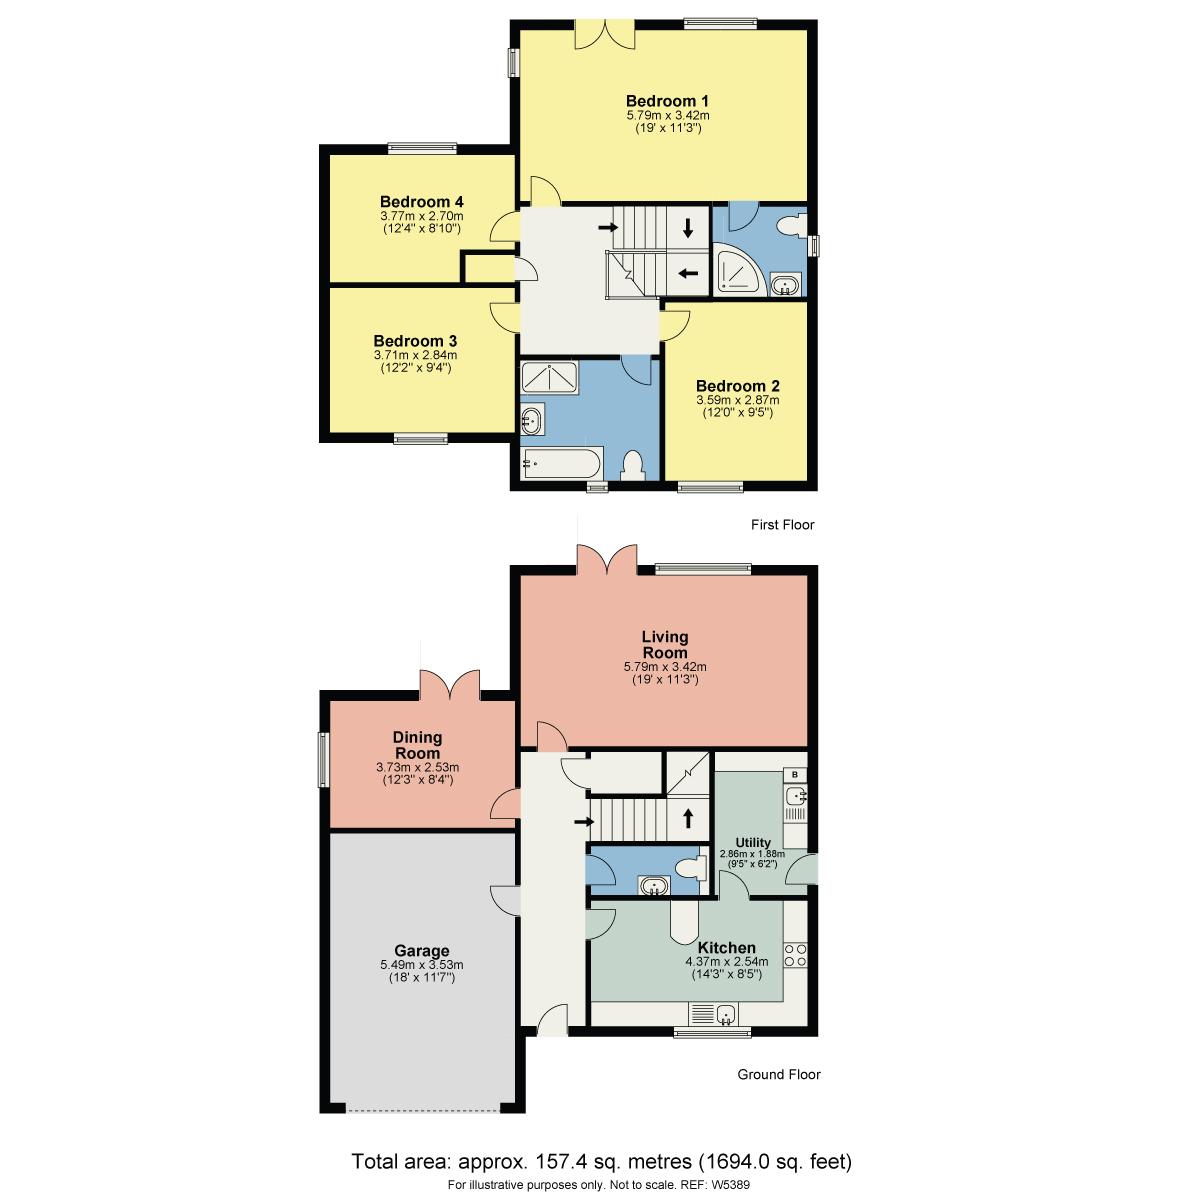 Floorplan 2 Edlan Place, Old Hall Road, Troutbeck Bridge, Windermere, Cumbria, LA23 1QE